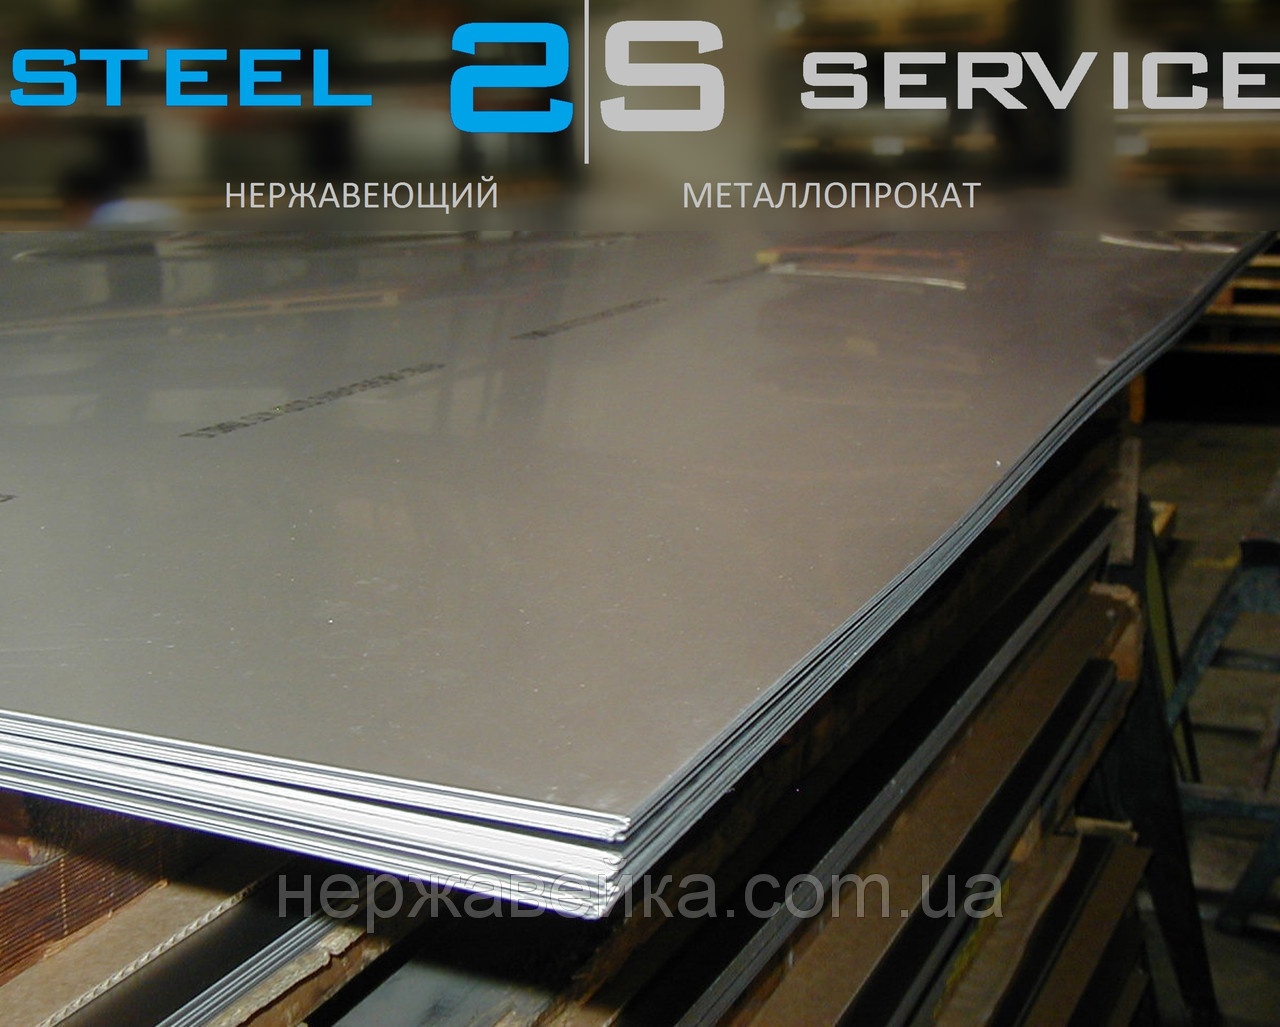 Листовая нержавейка 30х1500х3000мм  AISI 316Ti(10Х17Н13М2Т) F1 - горячекатанный,  кислотостойкий